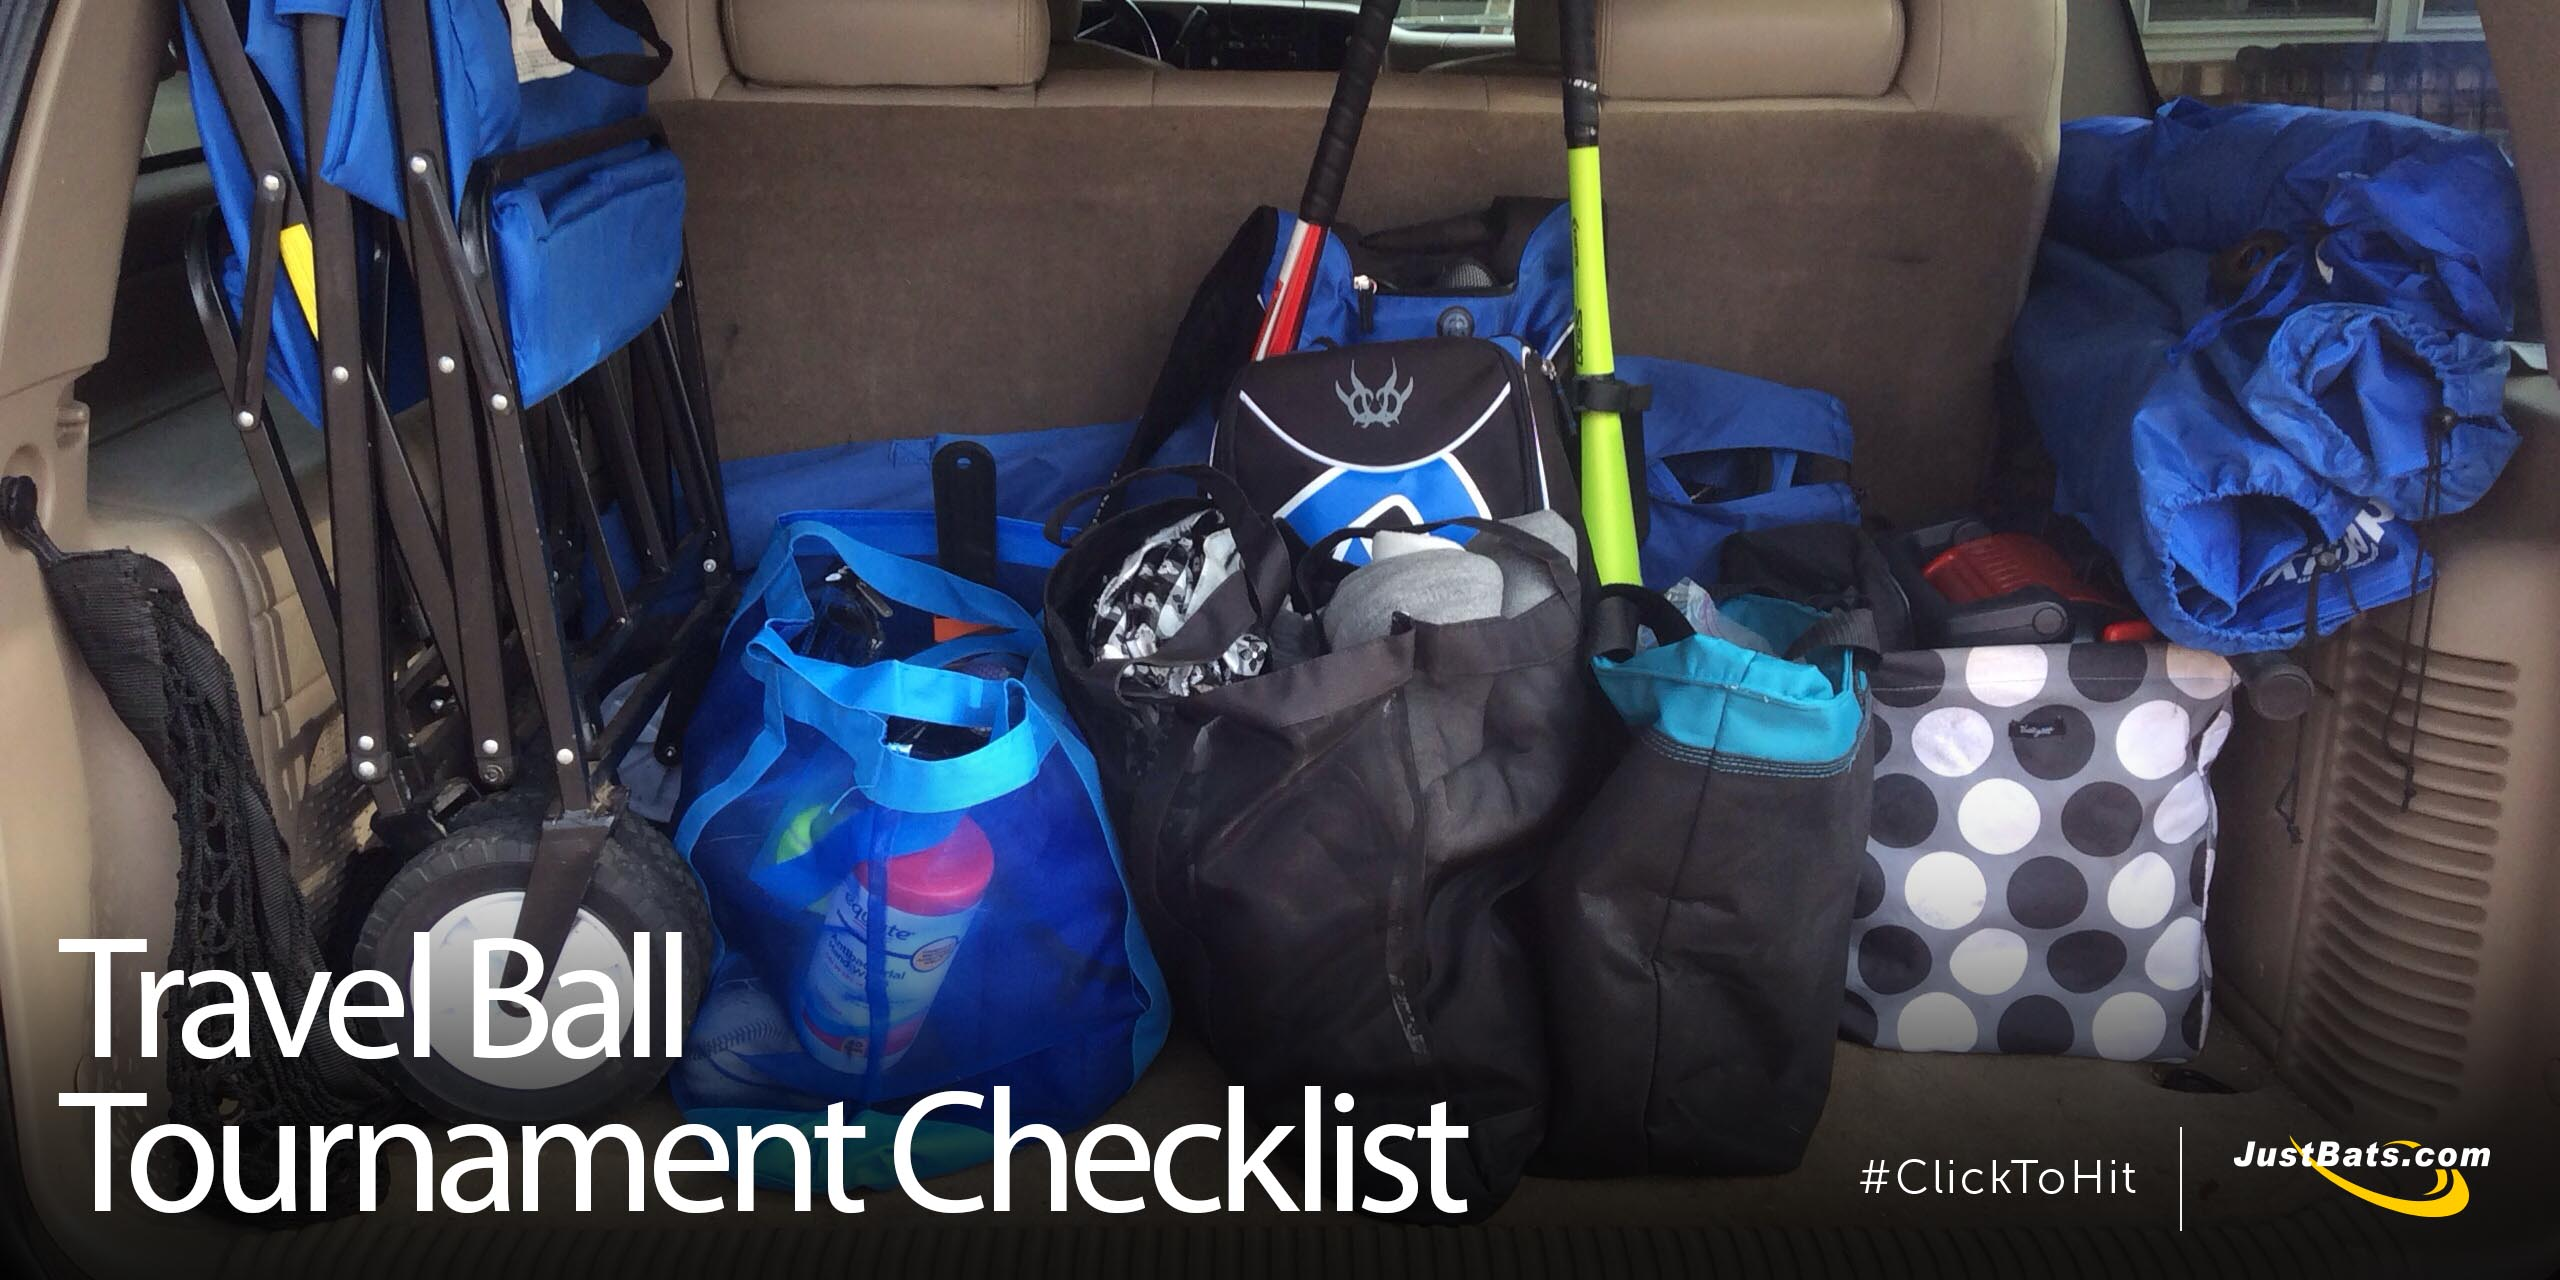 Travel Ball Tournament Checklist-2.jpg